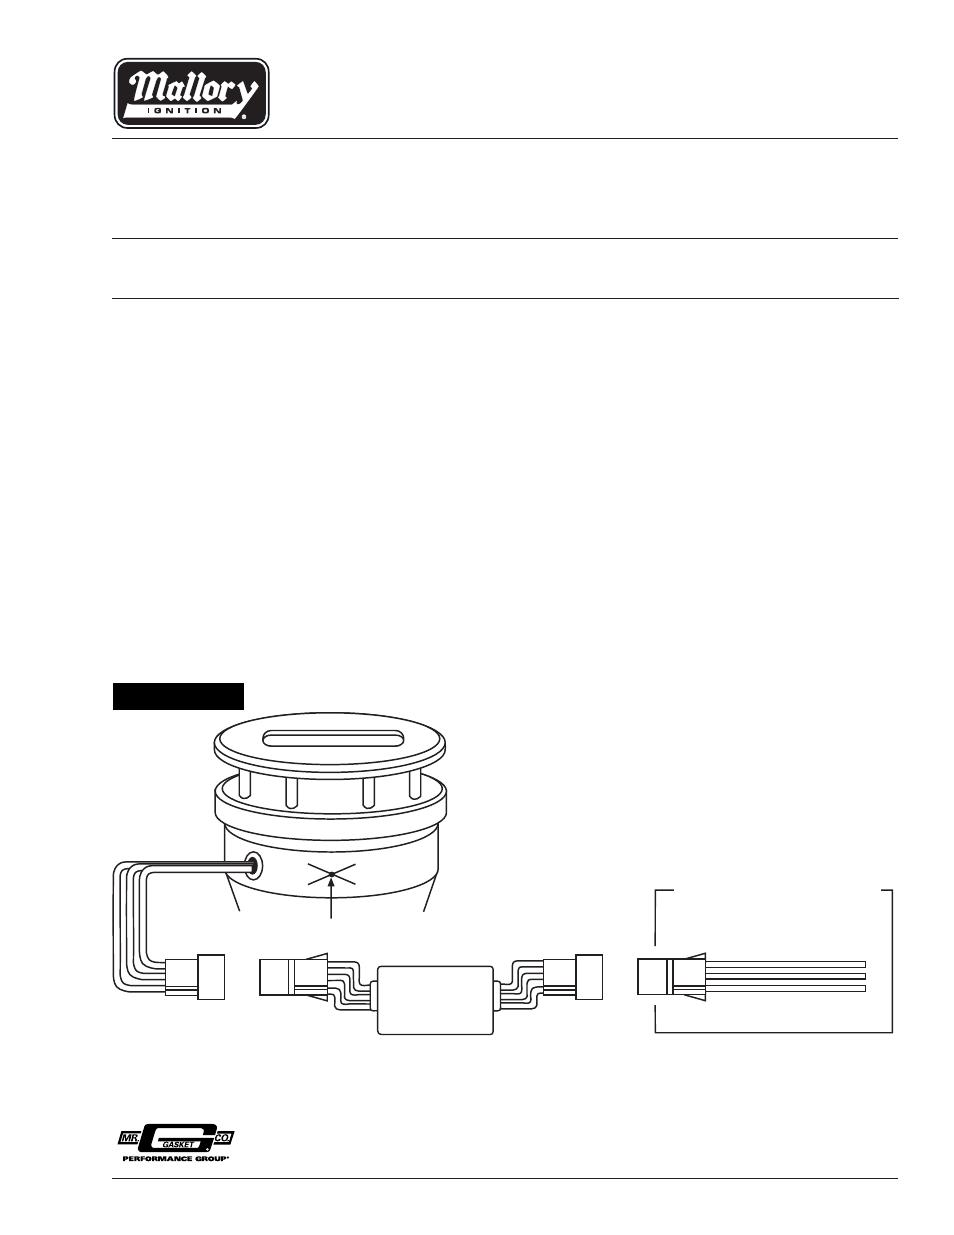 medium resolution of wiring harnes guard